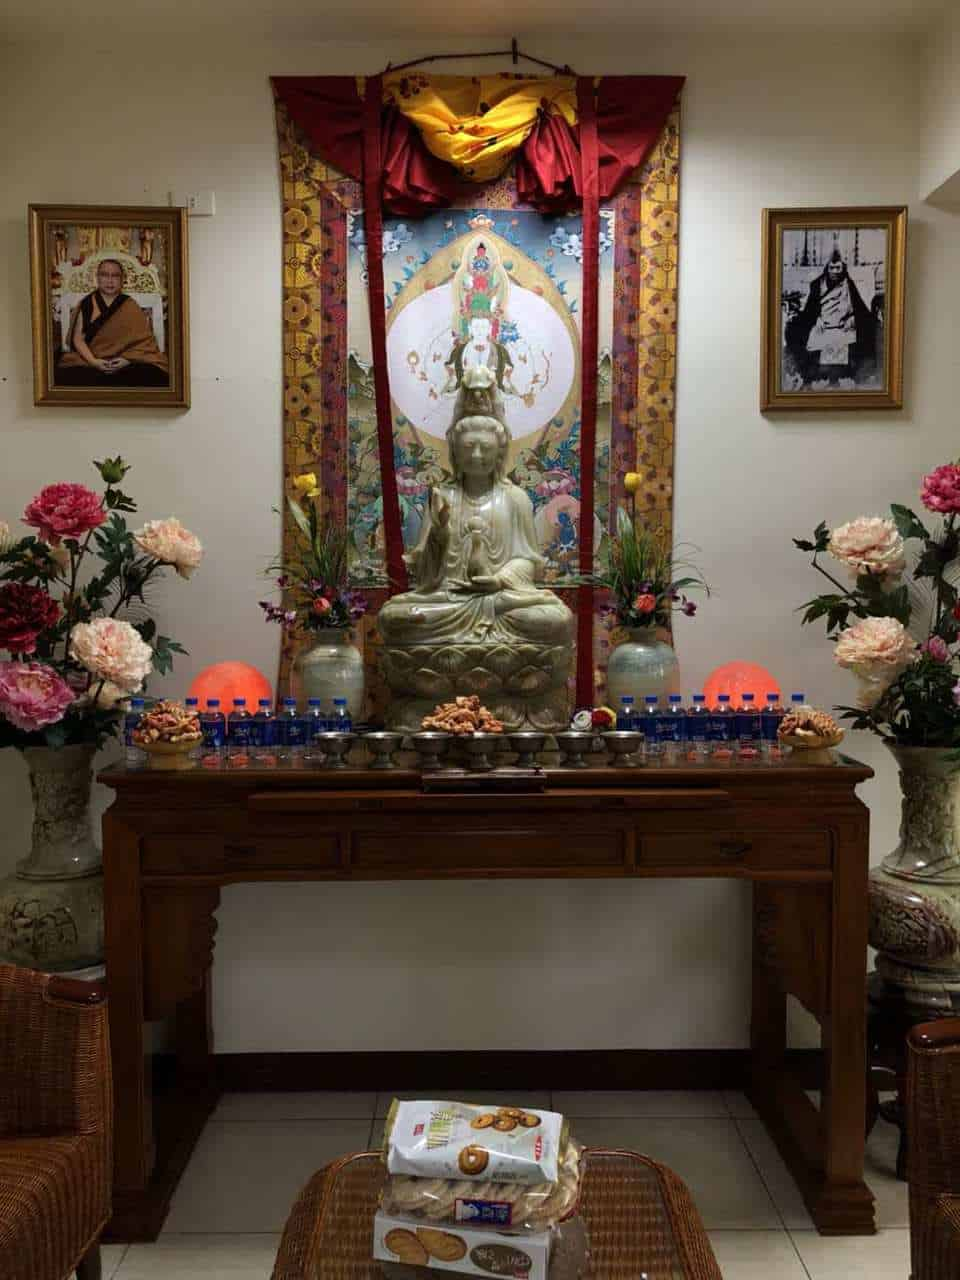 GosokRinpoche New Year 2018 Image_20180217221007